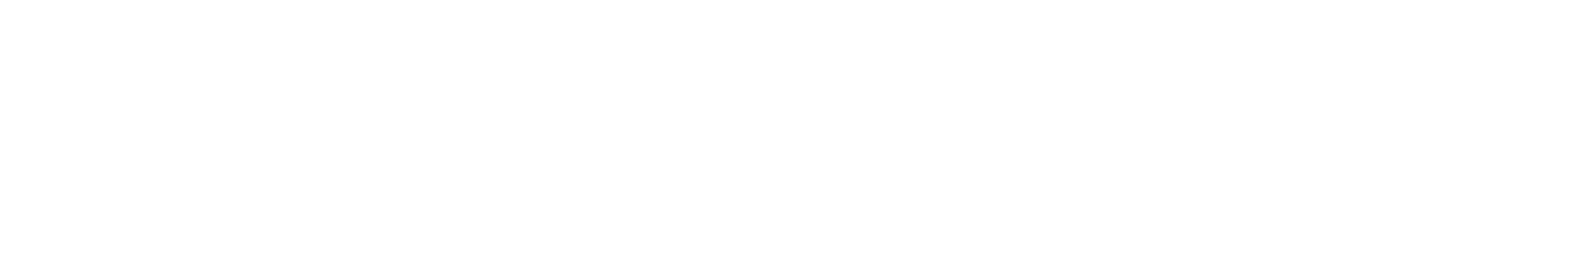 real_2